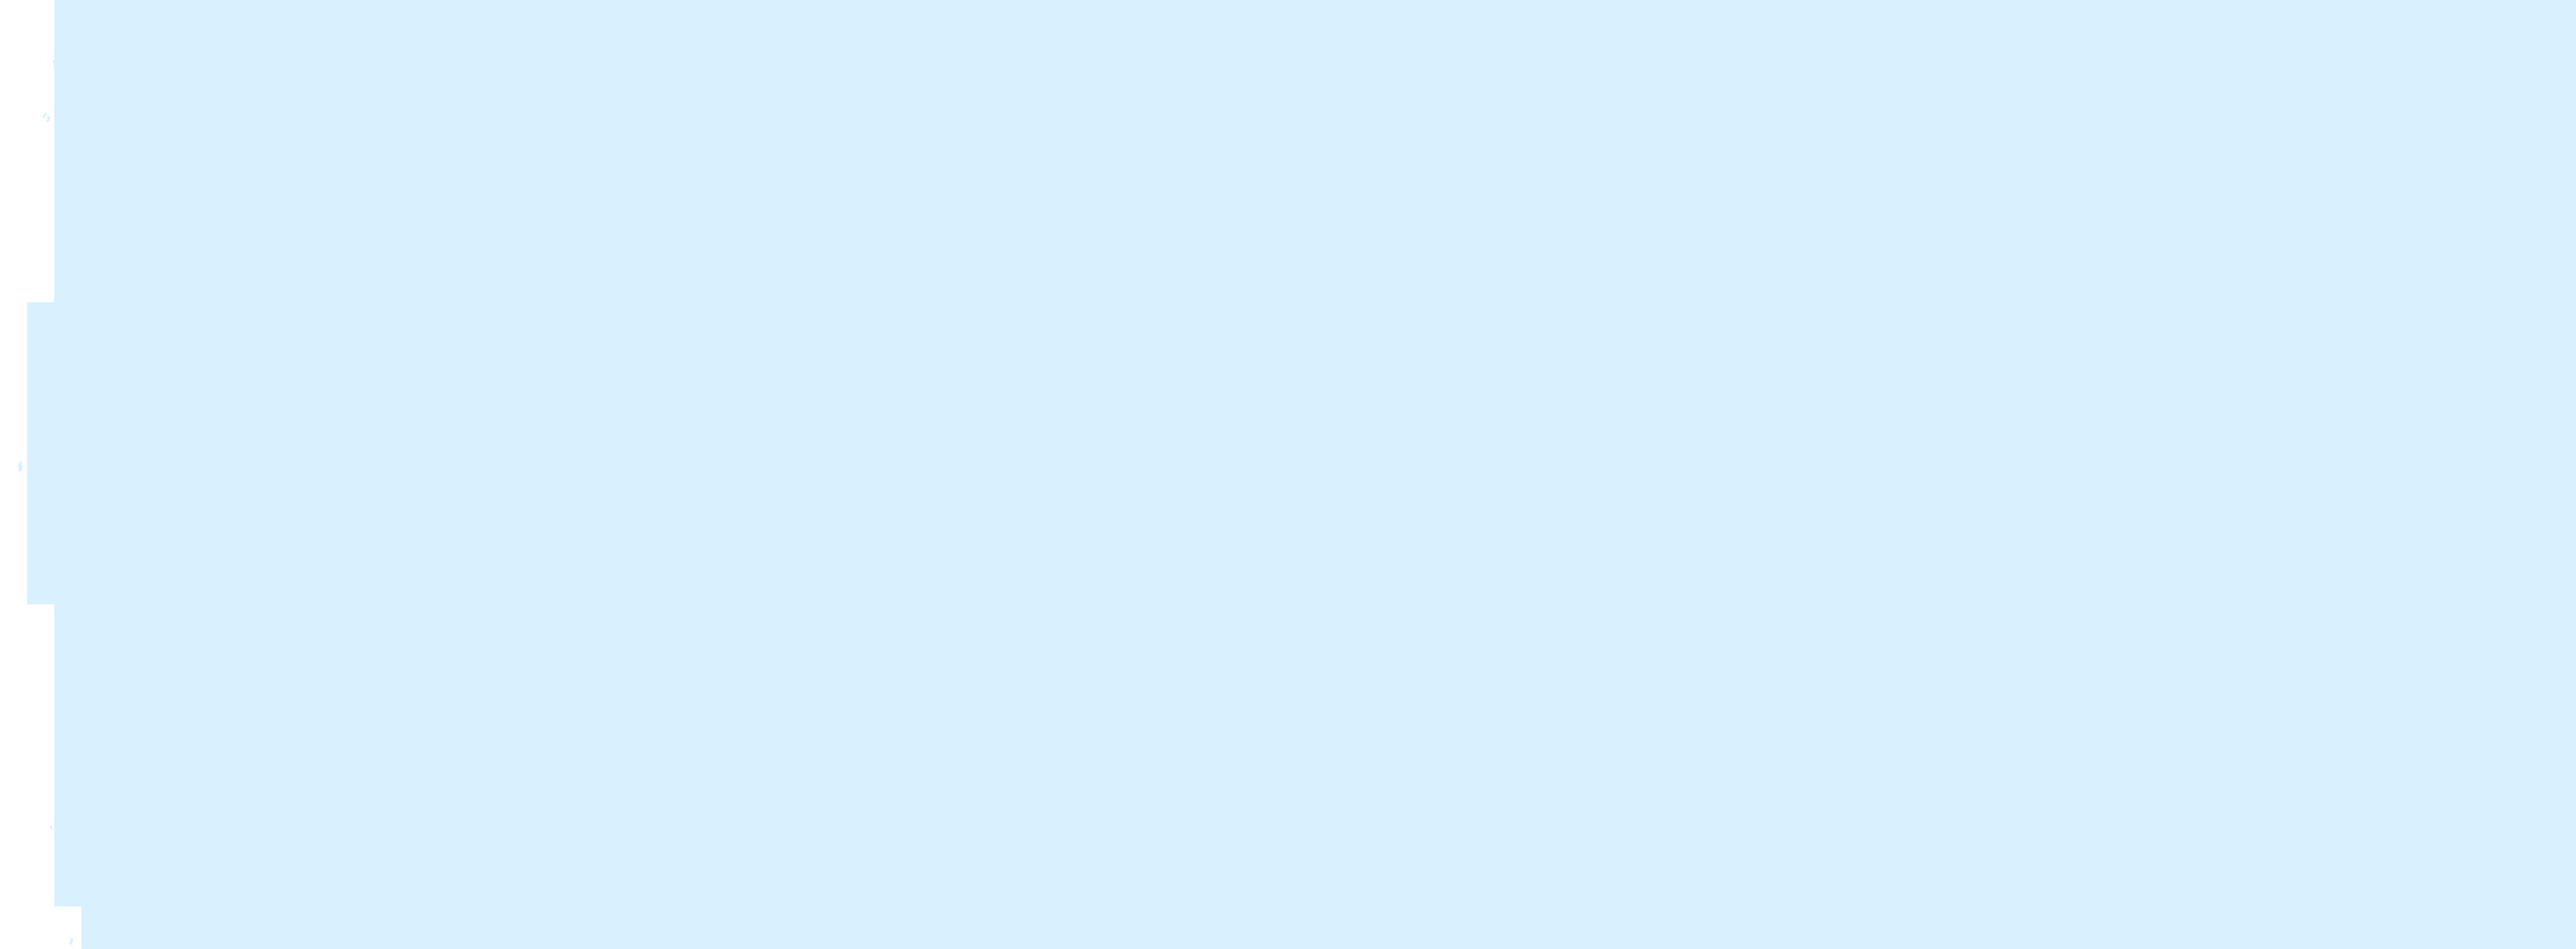 reason-01-f